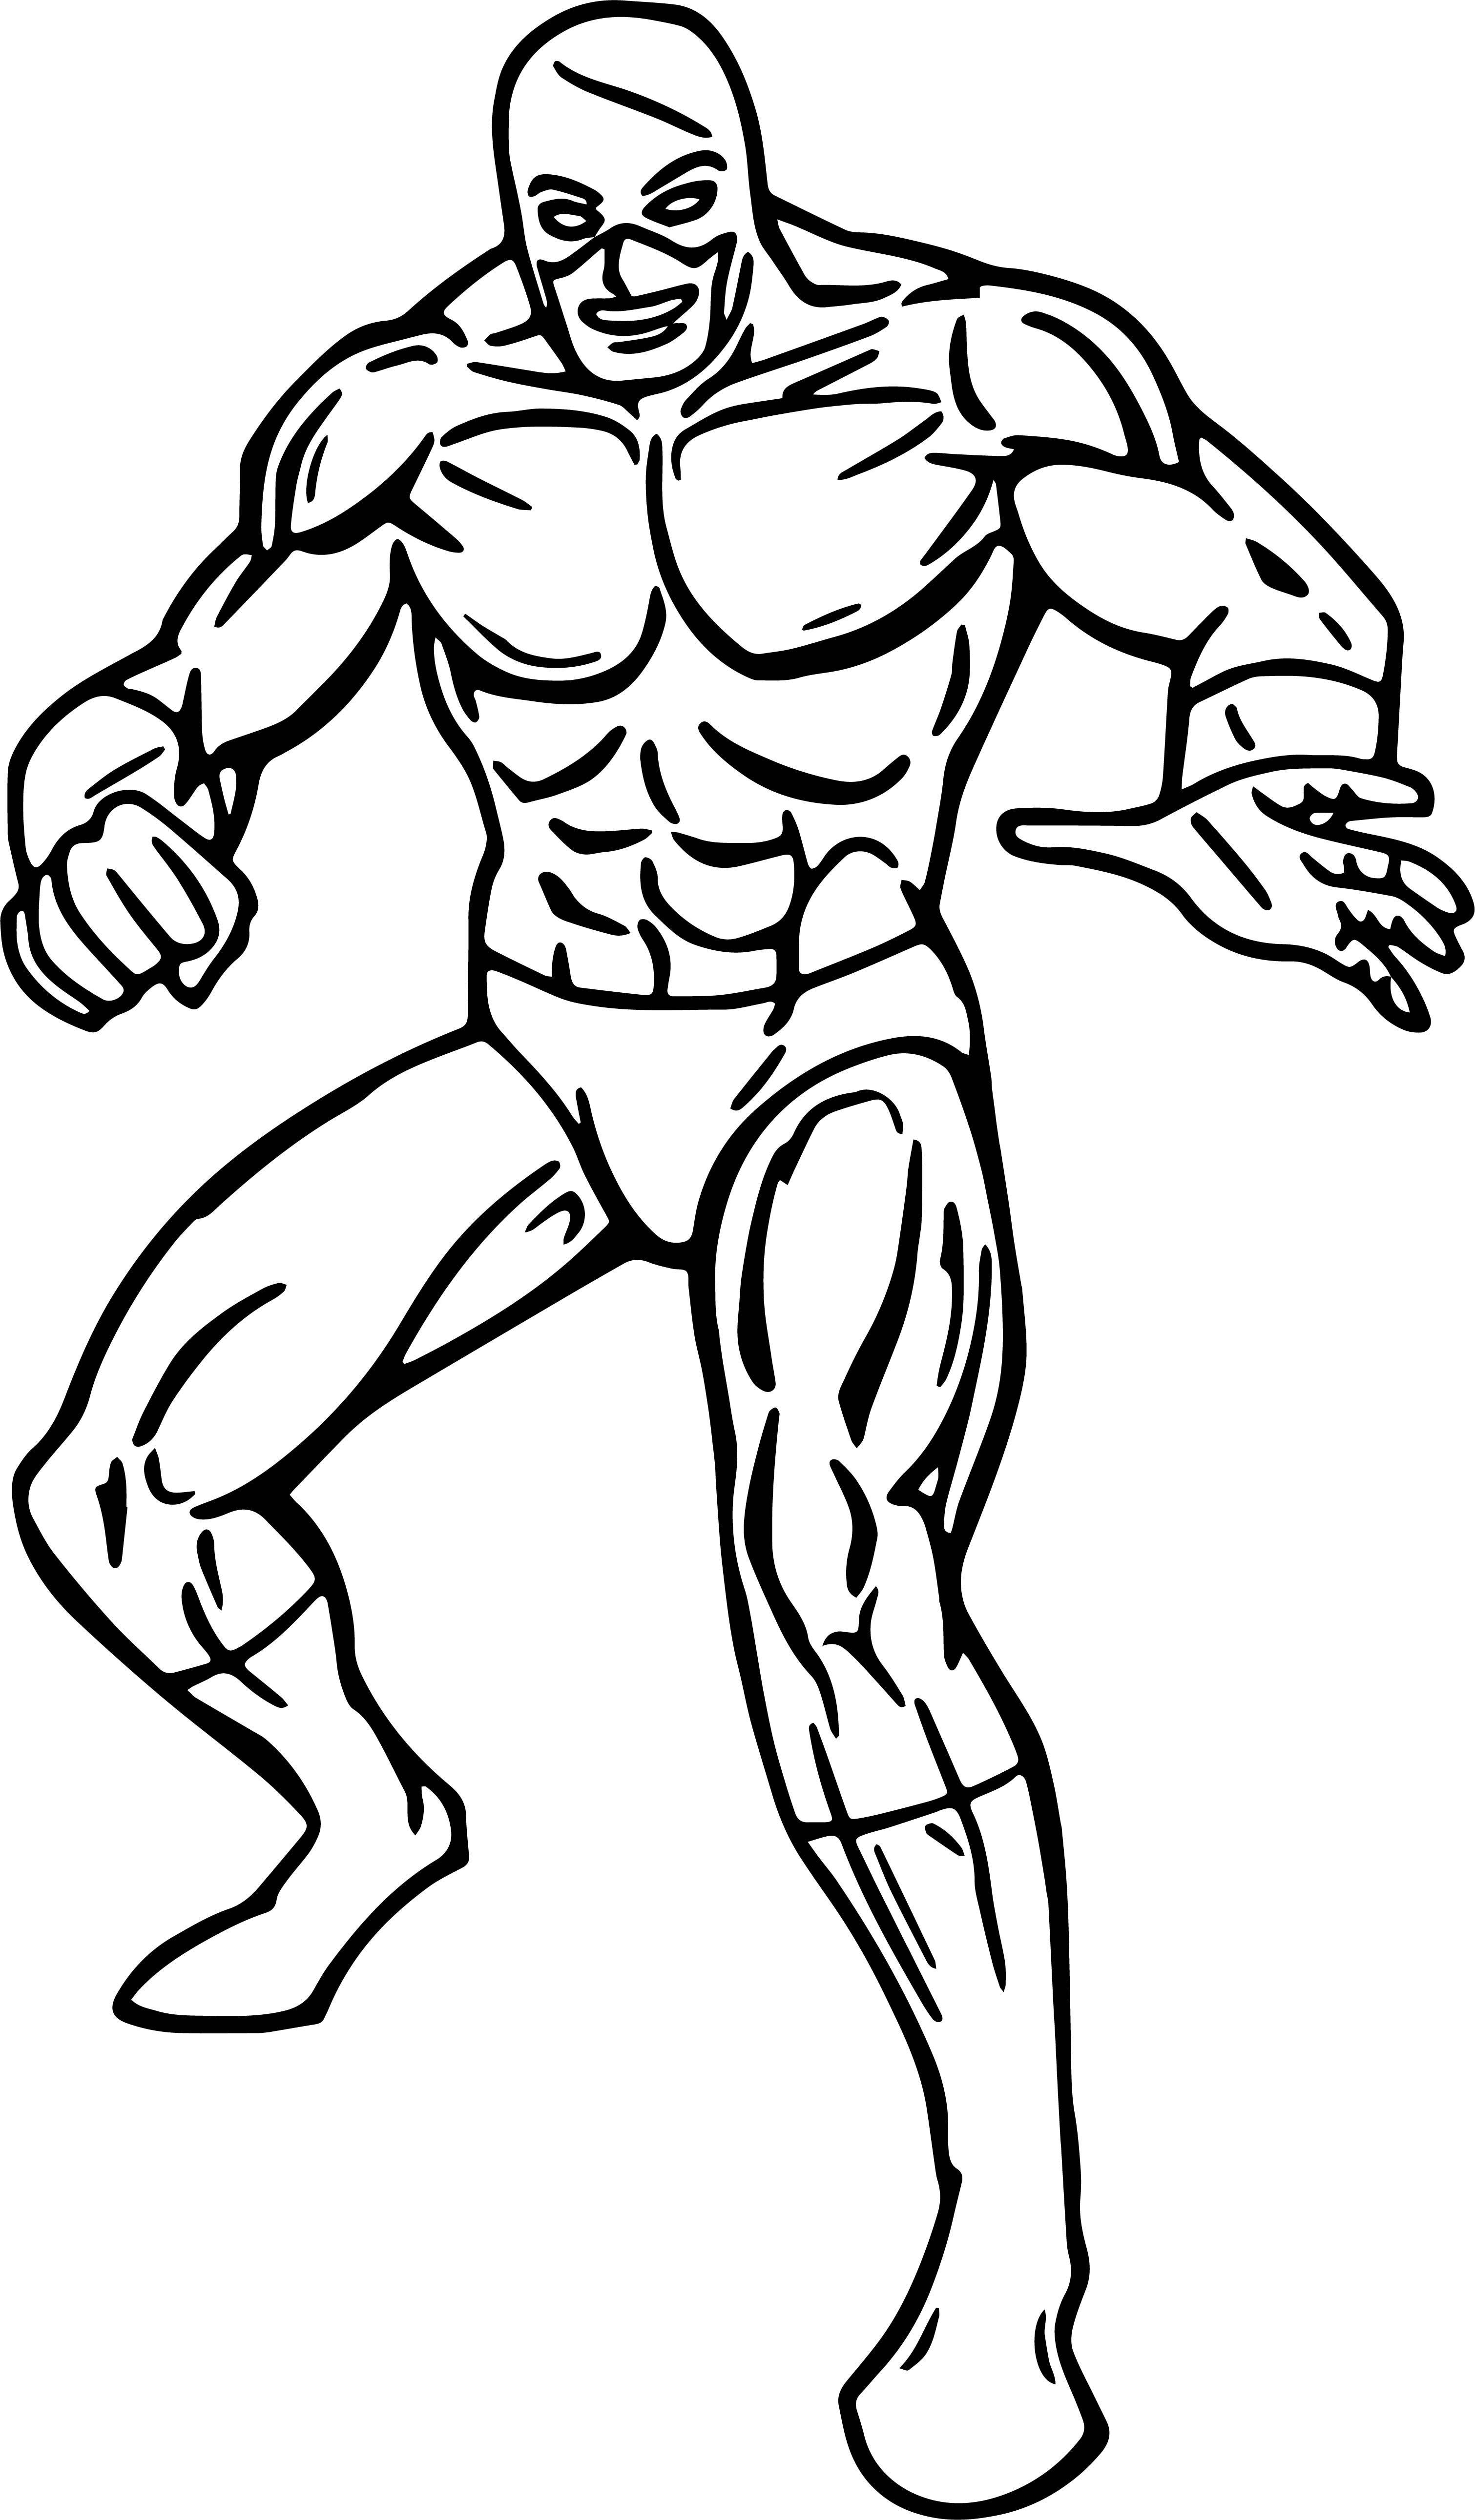 Smile Superheroes Super Hero Coloring Page